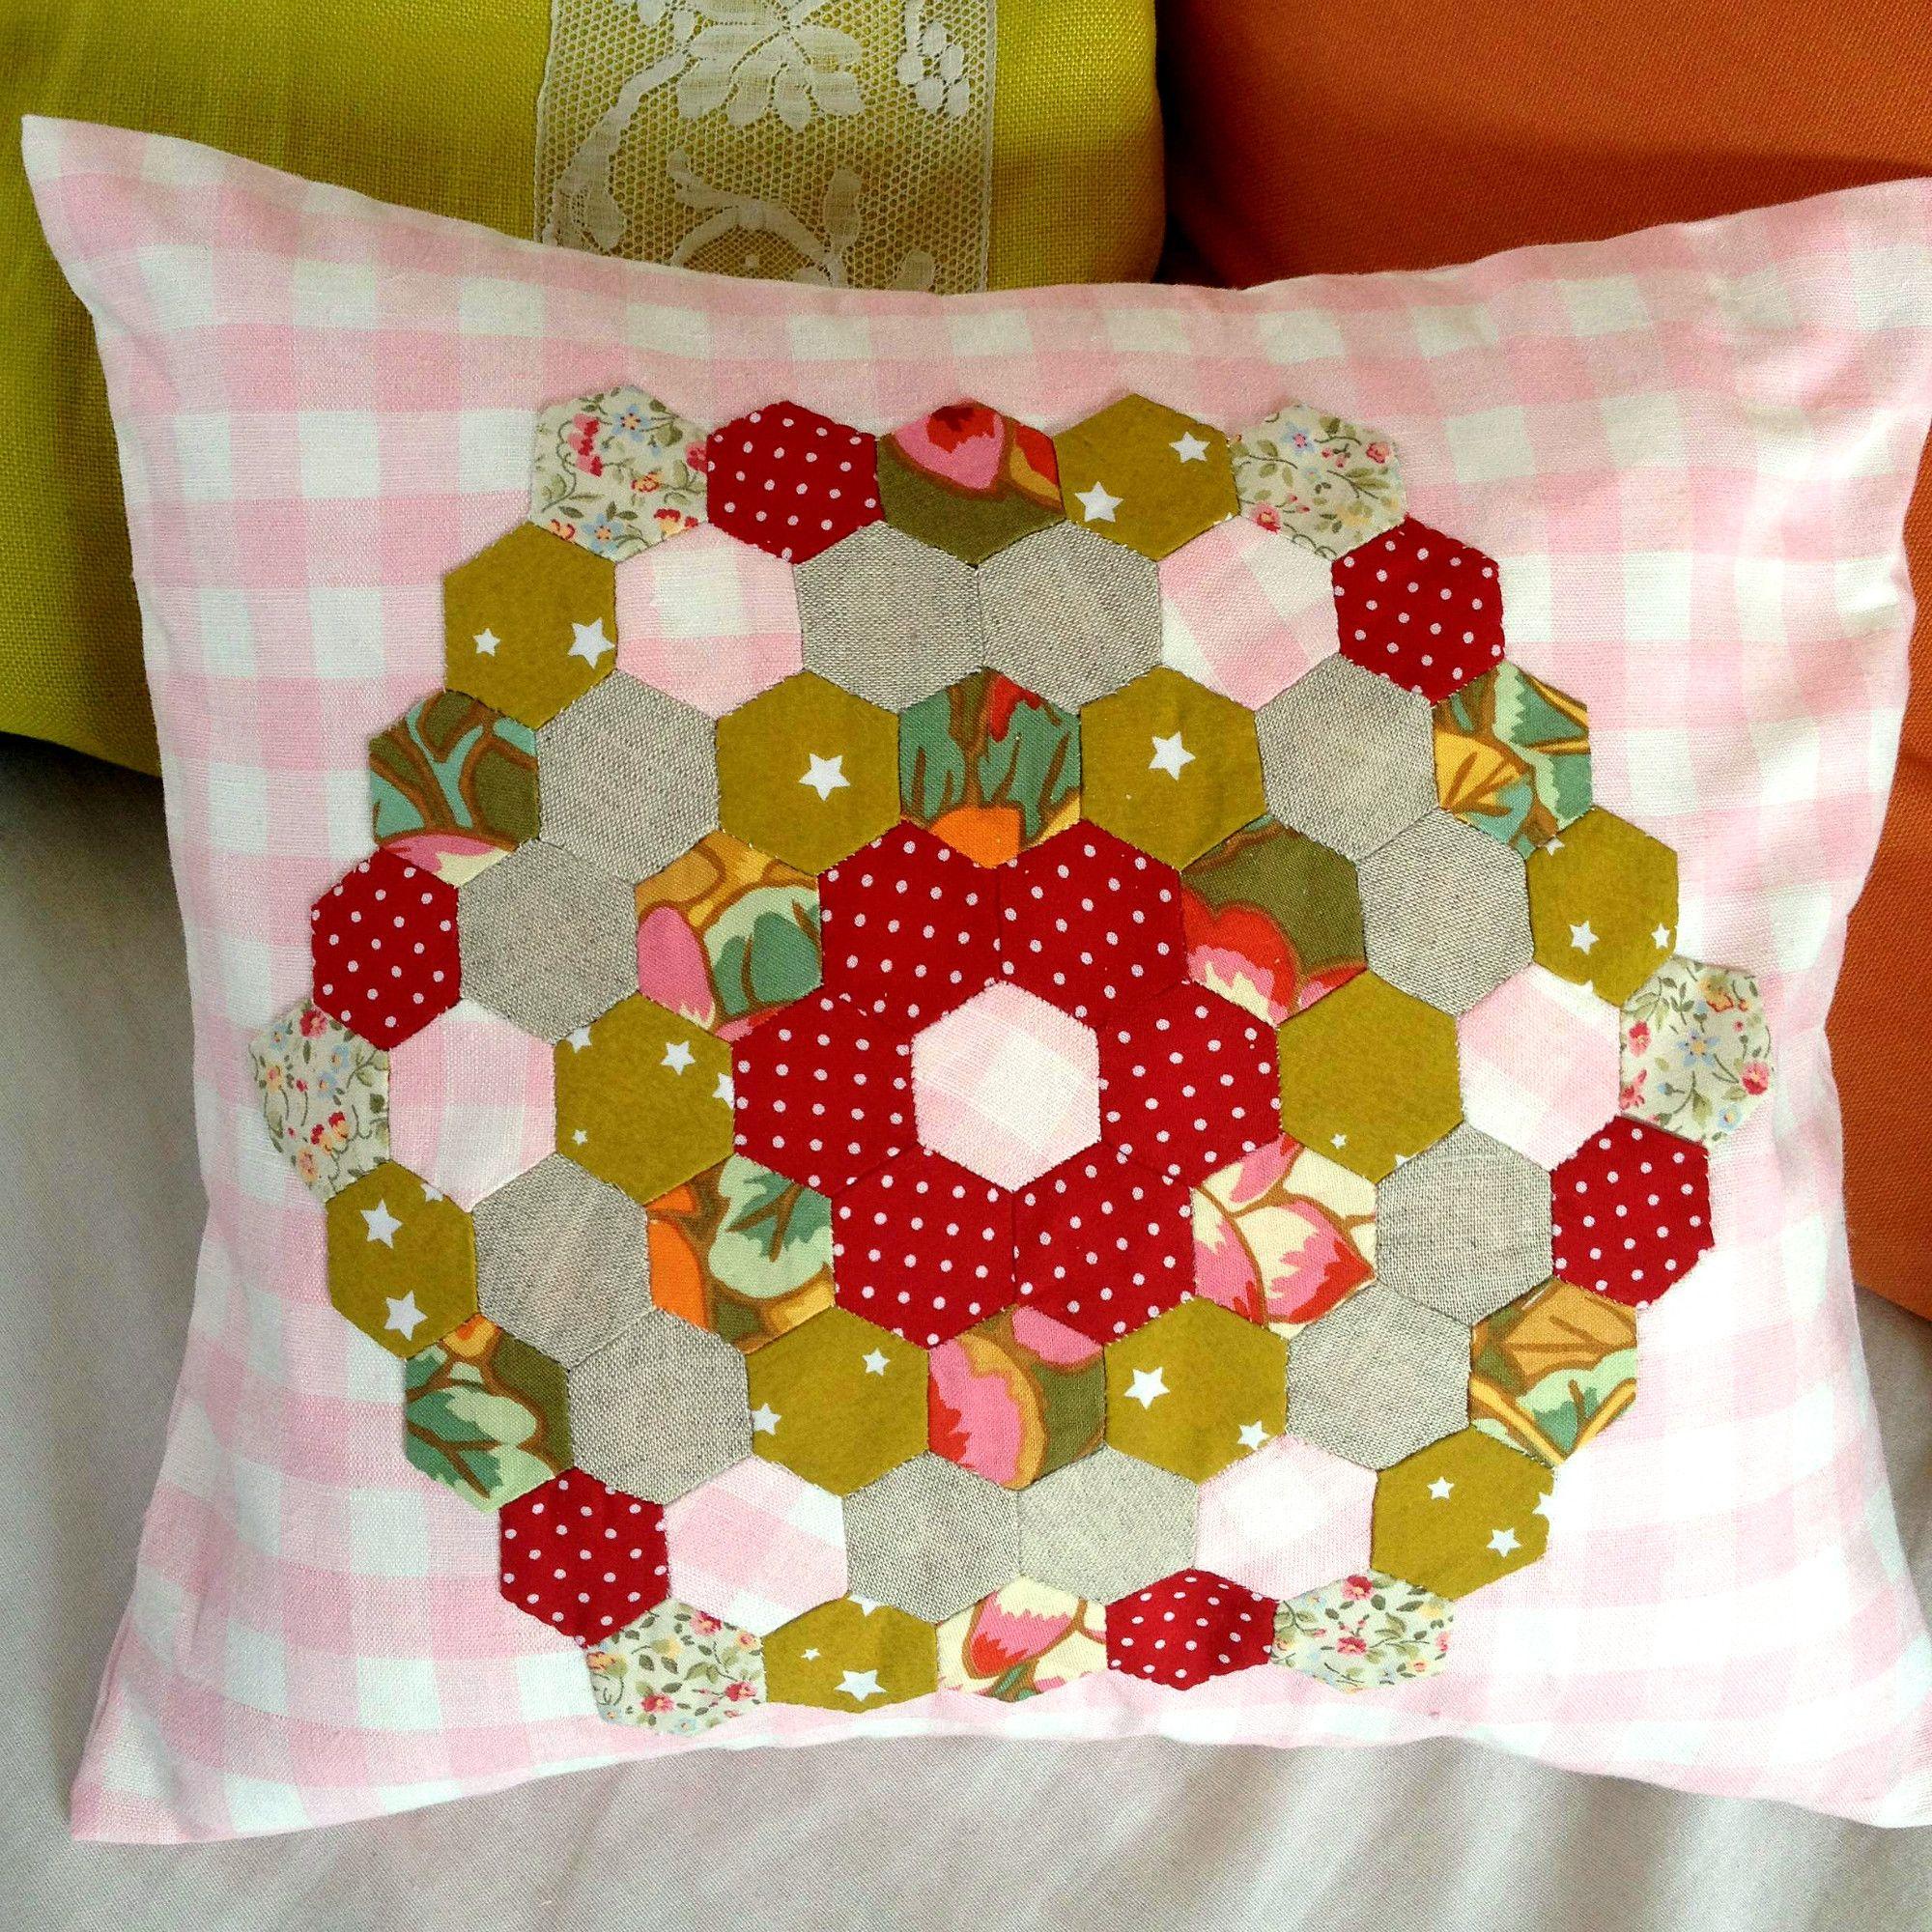 Jardin de grand-mère Patchwork | Ma petite couture | Pinterest ...